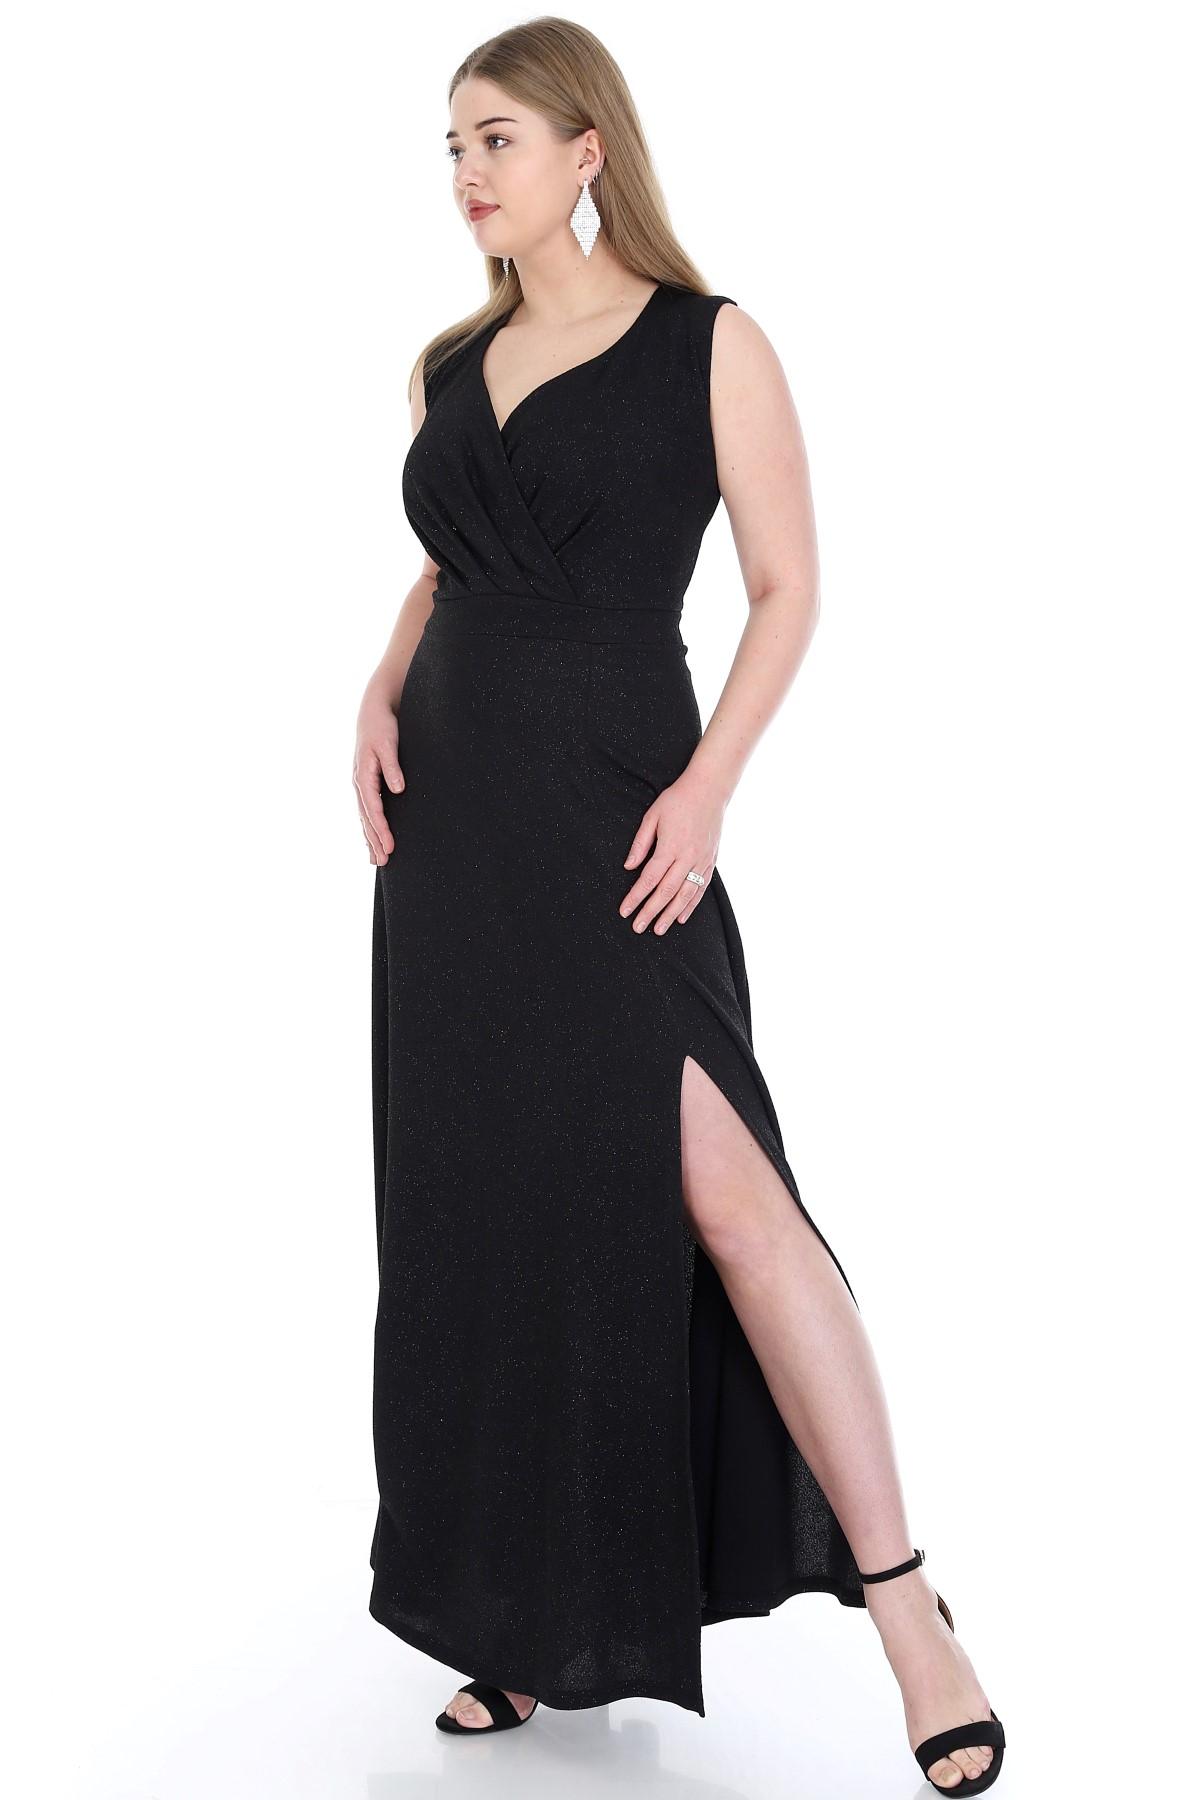 Women's Oversize Long Elastic Shiny Evening Dress